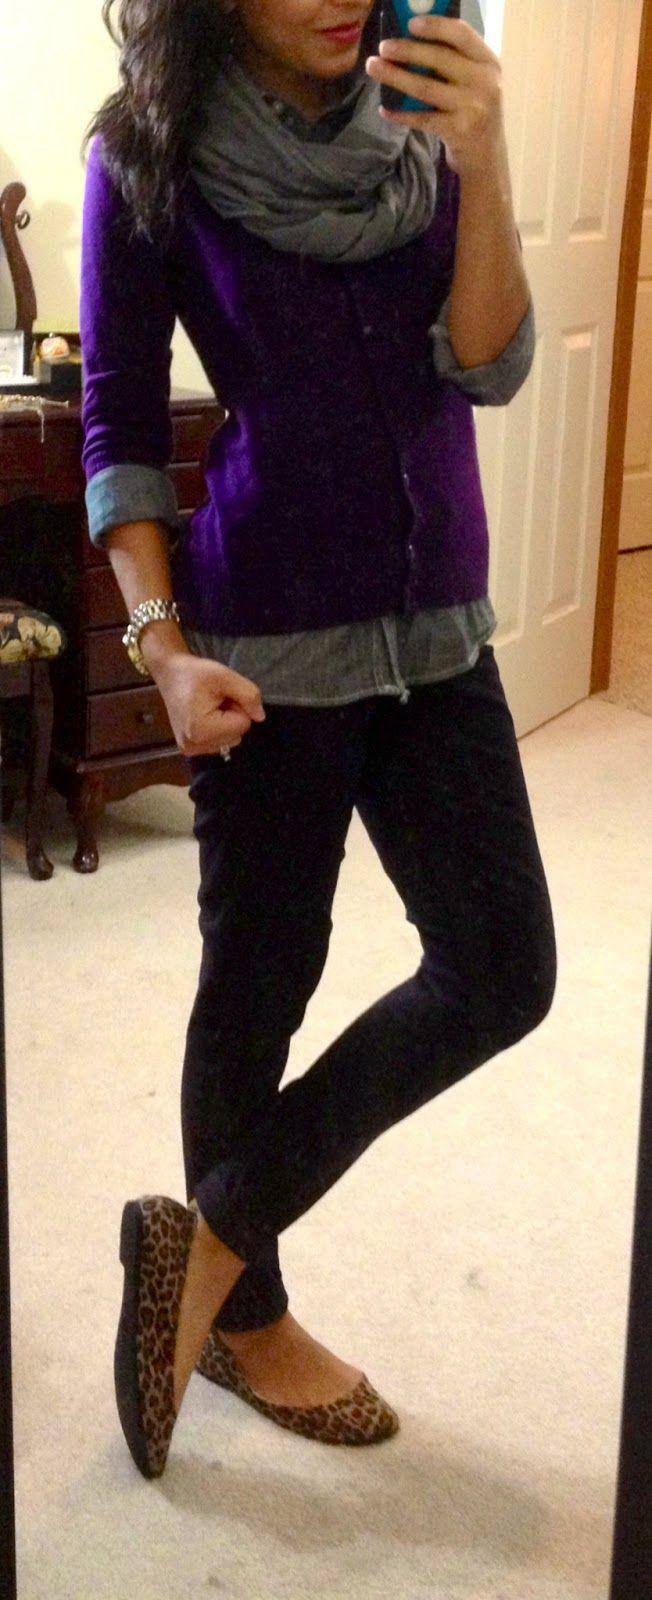 Cute! Purple, layers, leopard flats